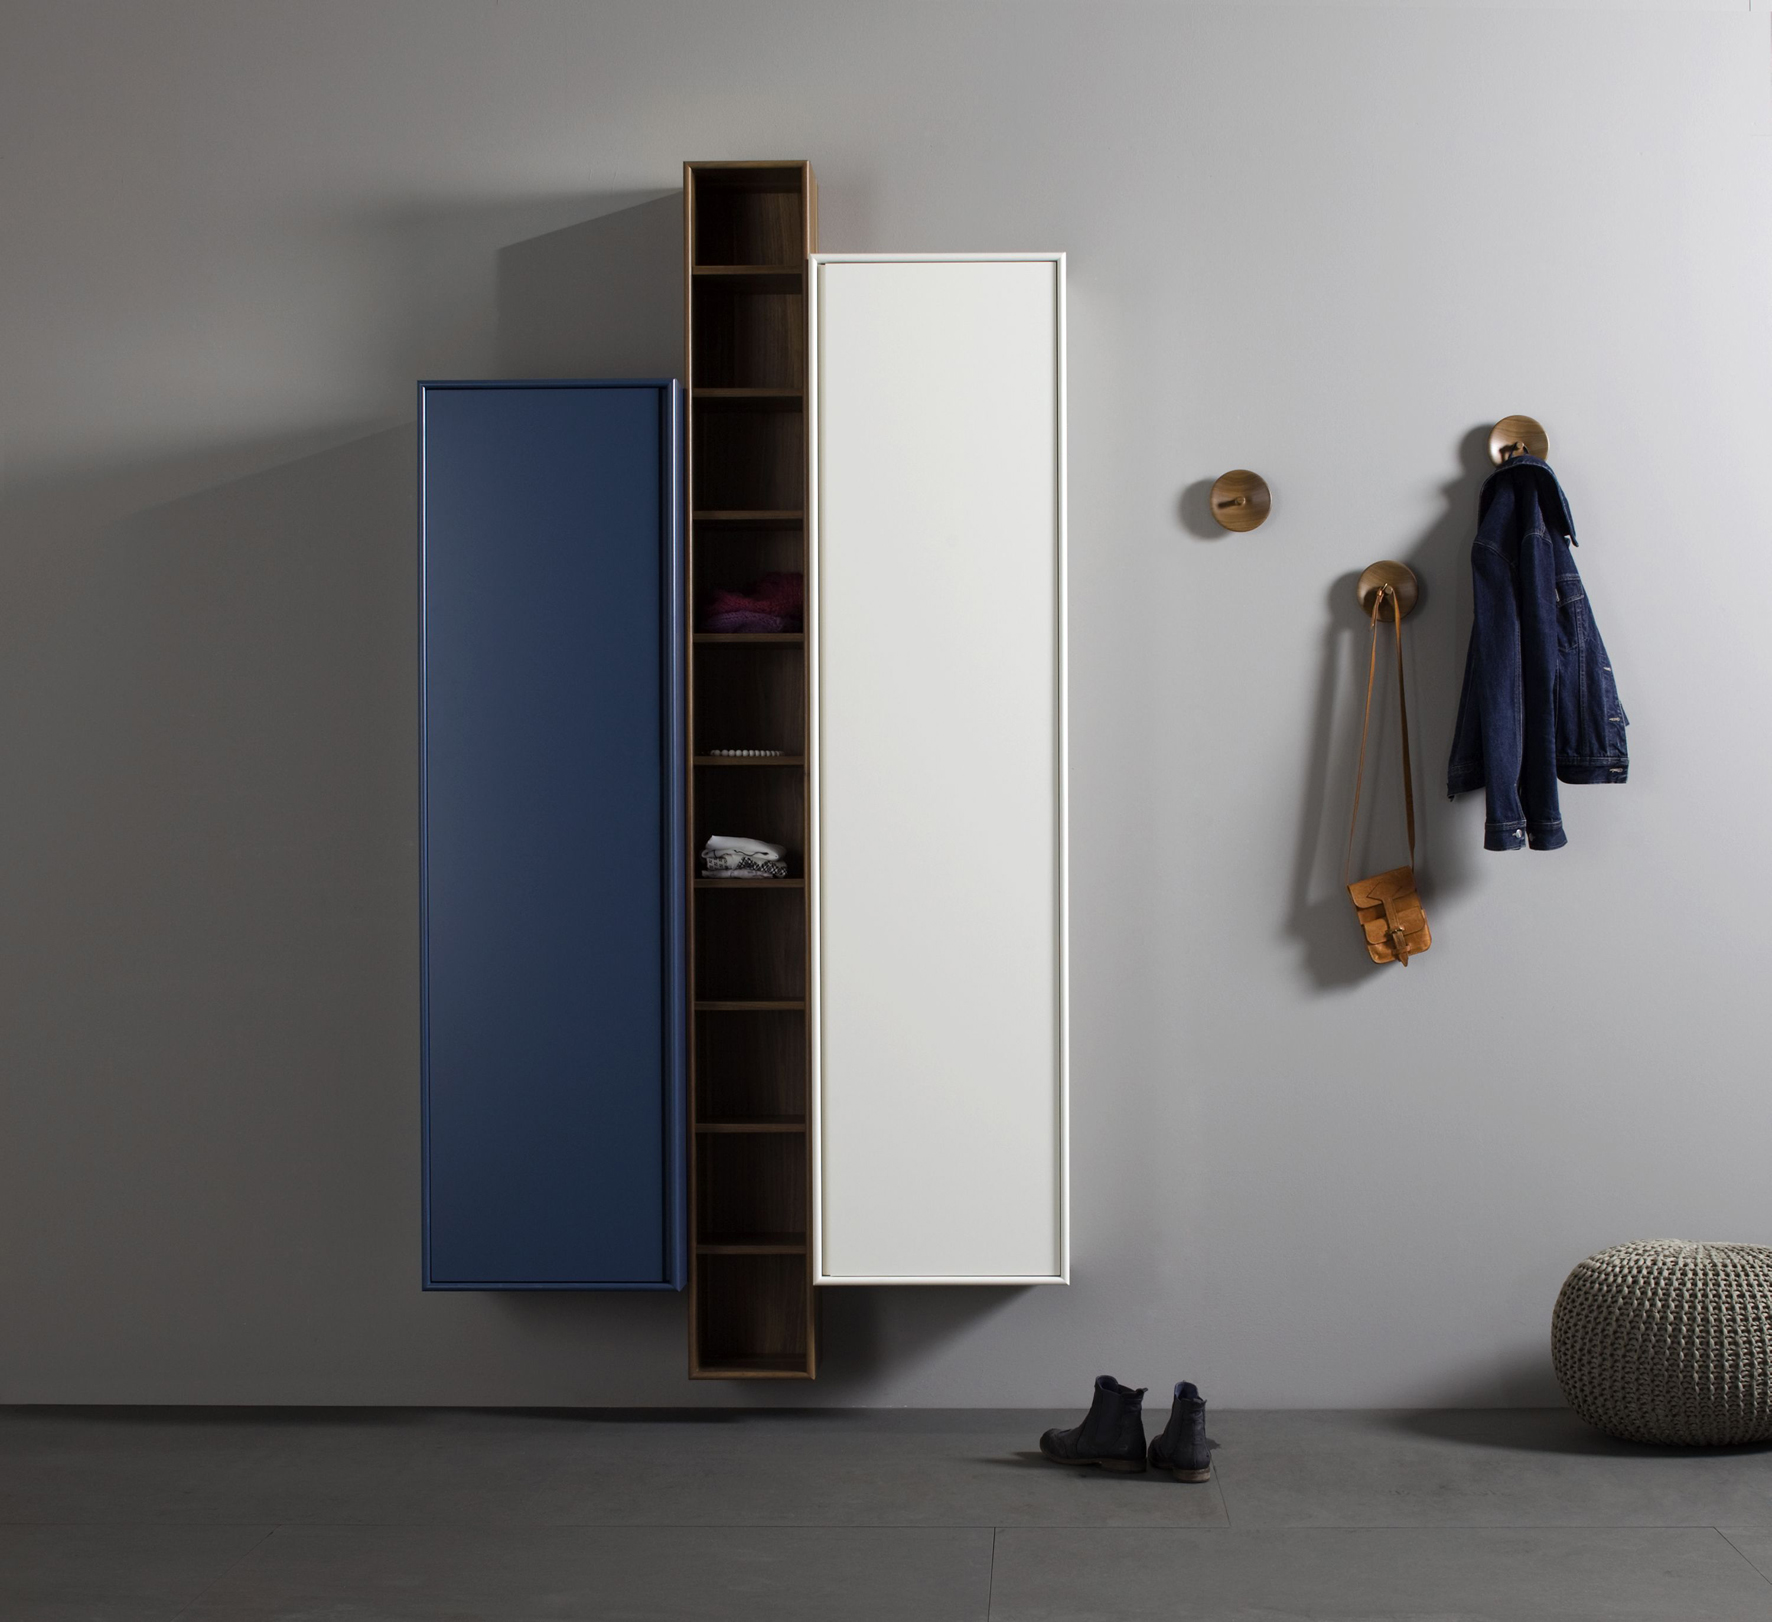 Eine runde sache garderobe panama von sudbrock - Sudbrock garderobe ...